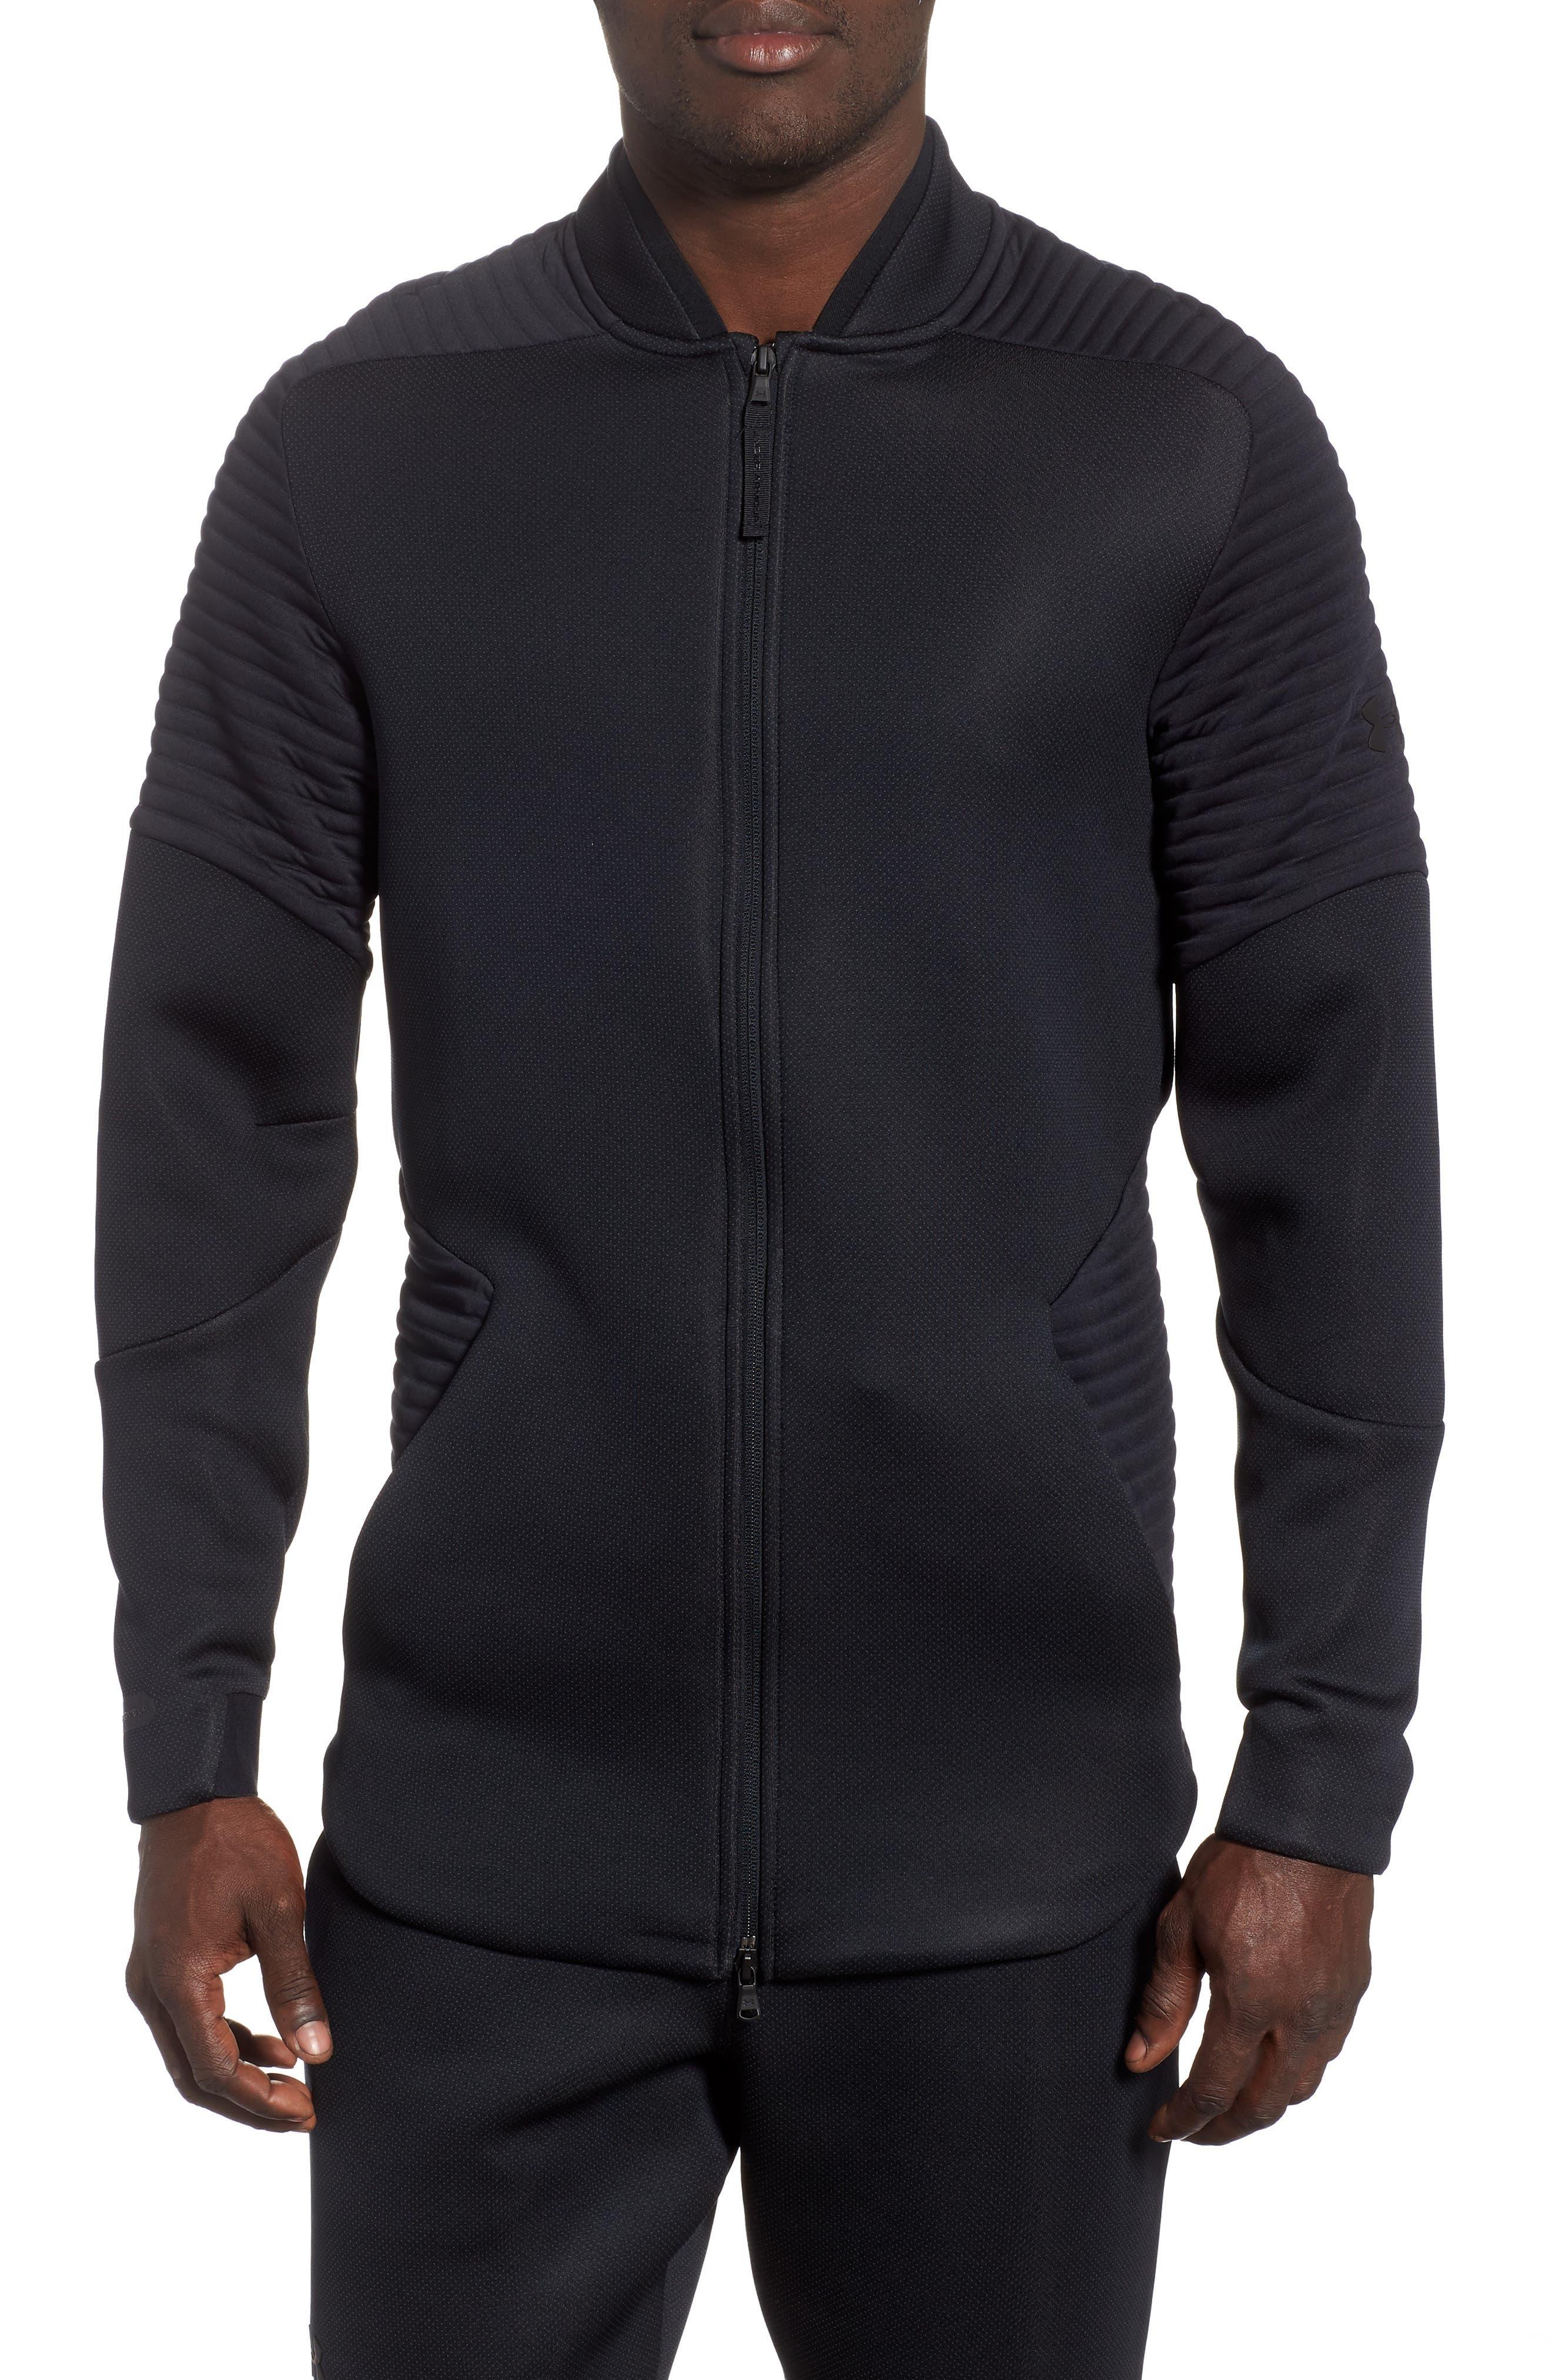 Unstoppable /MOVE Jacket,                         Main,                         color, BLACK/ CHARCOAL/ BLACK